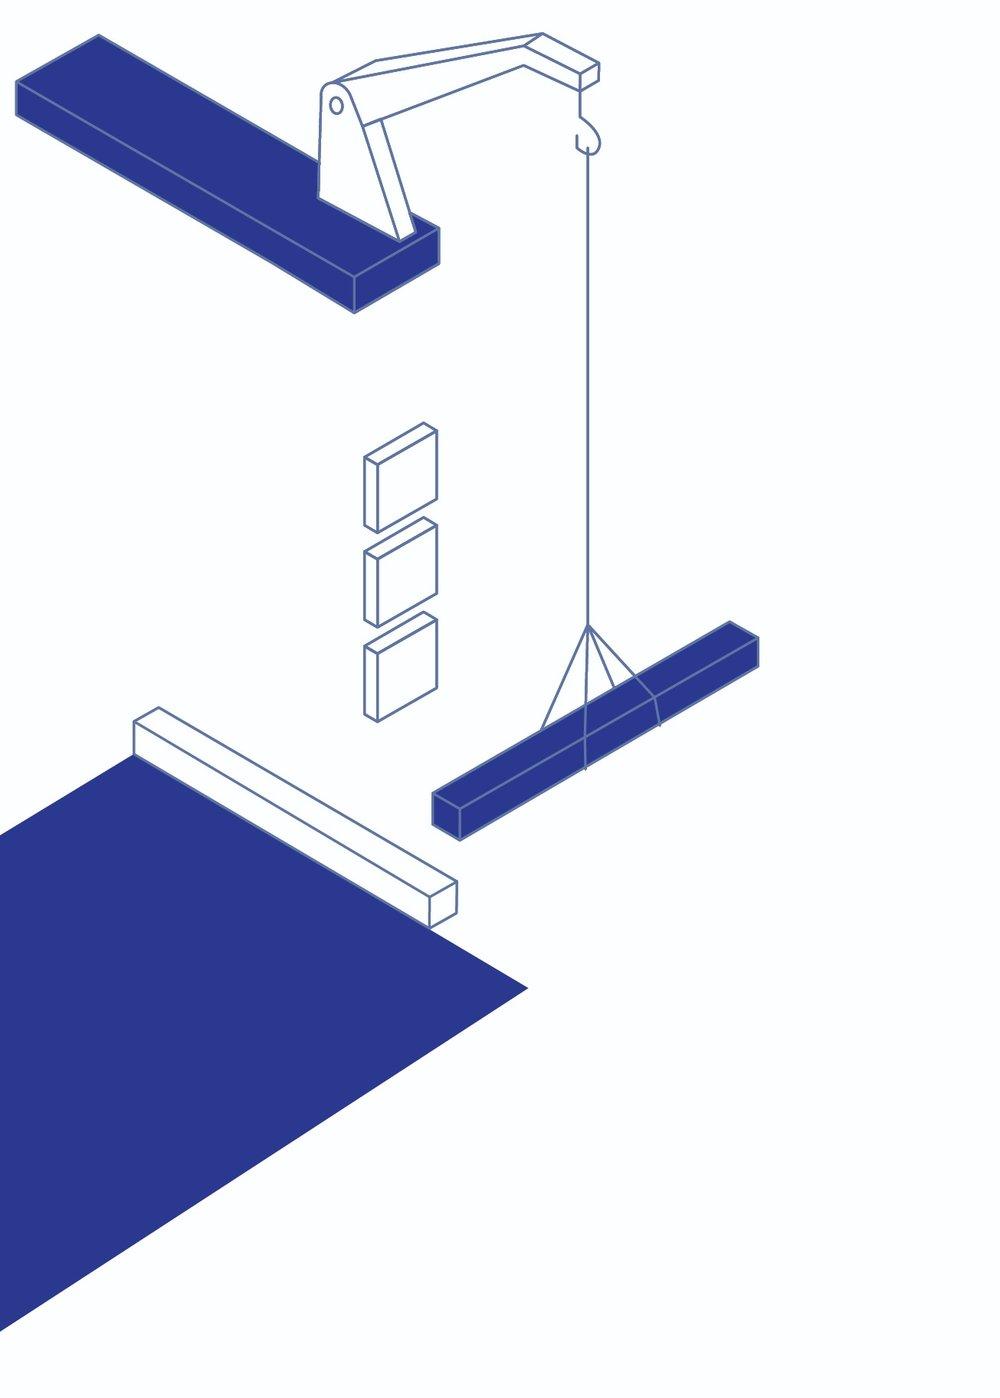 blueprint3-04.jpg